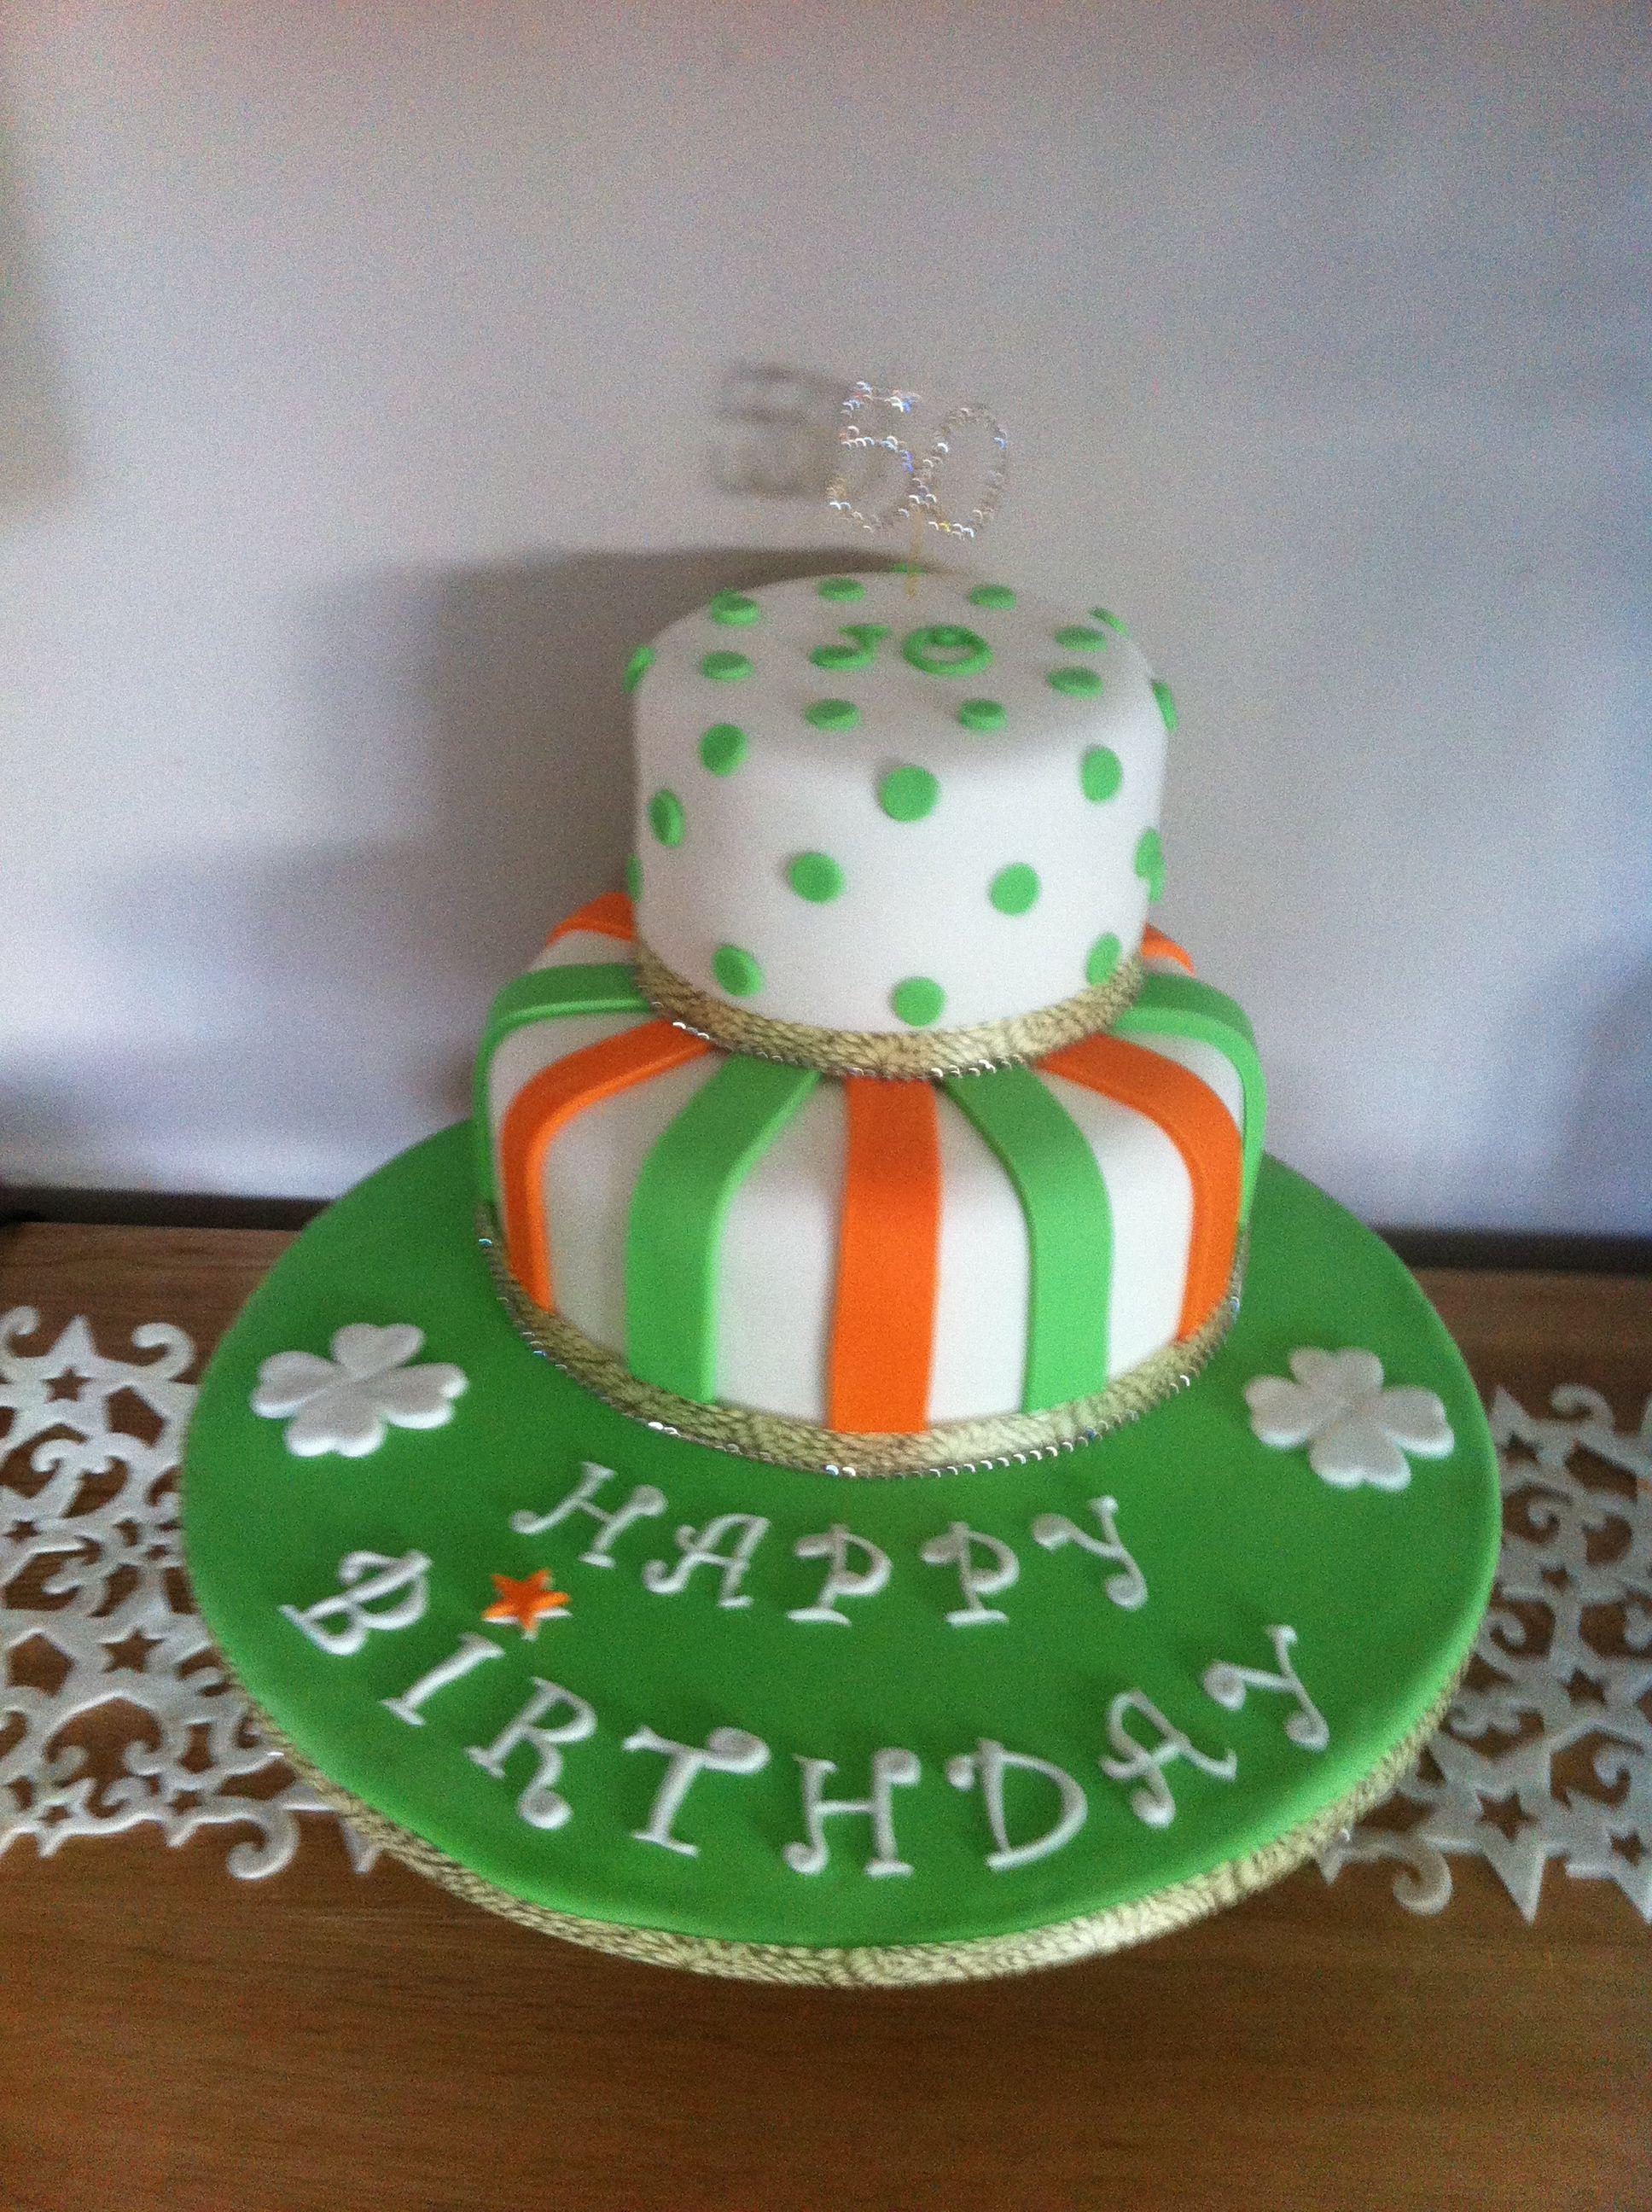 Surprising Irish Themed 50Th Birthday Cake With Images Themed Birthday Personalised Birthday Cards Veneteletsinfo